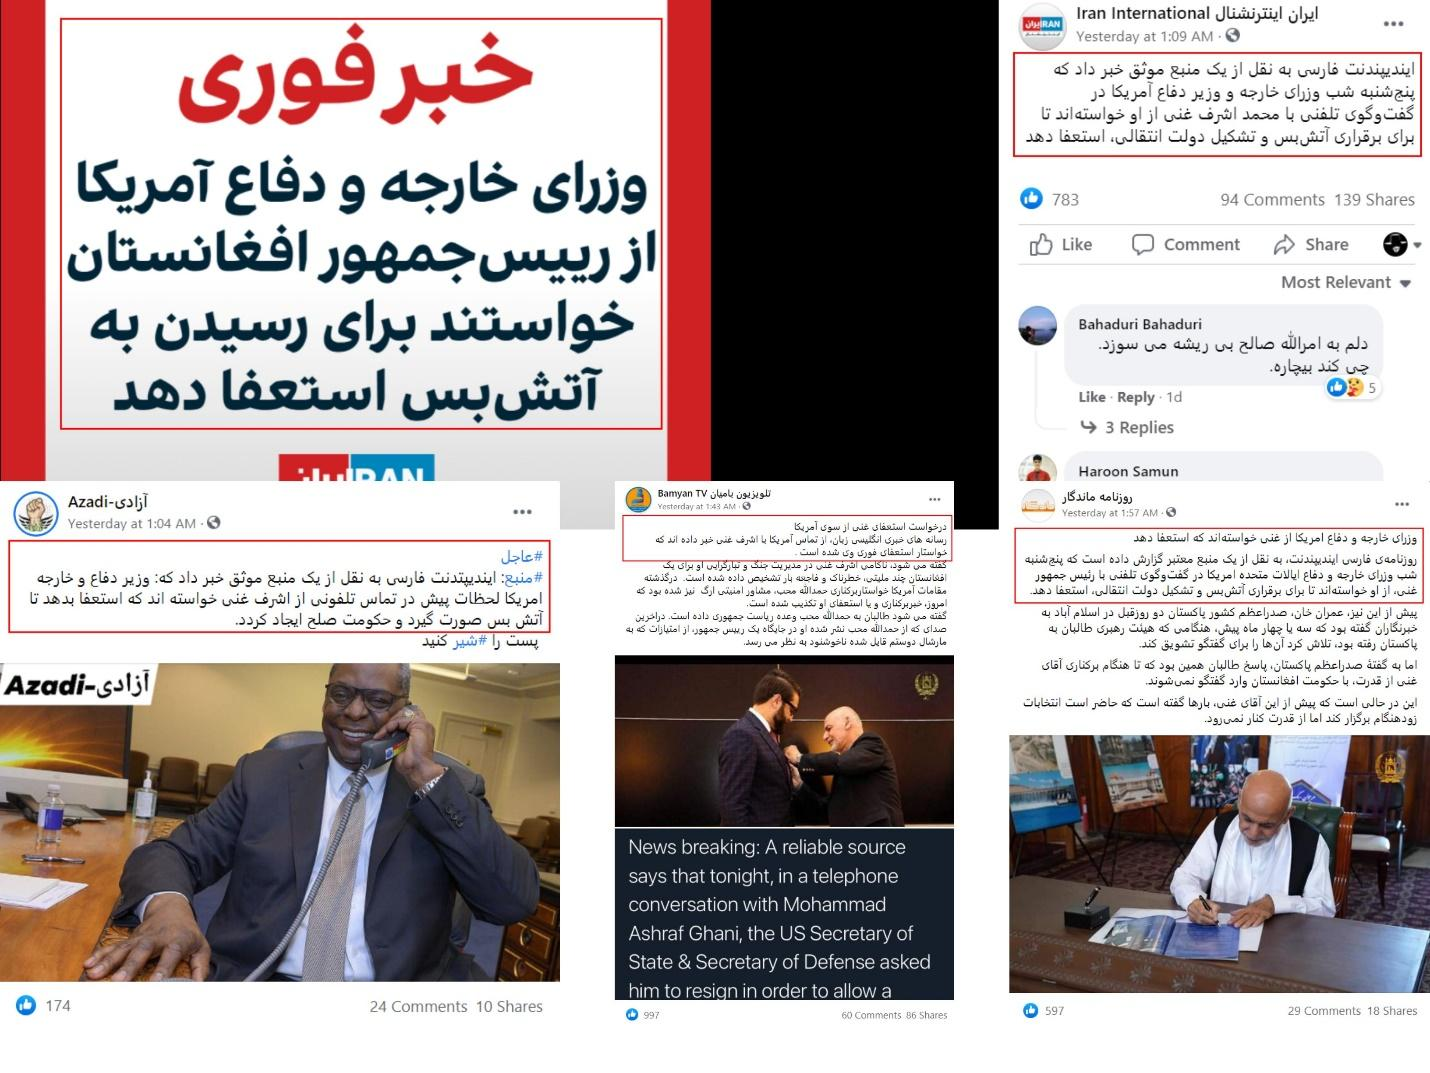 C:\Users\Dell-Vio\Desktop\14.08.2021\Resignation of Mohammad Ashraf Ghani.jpg